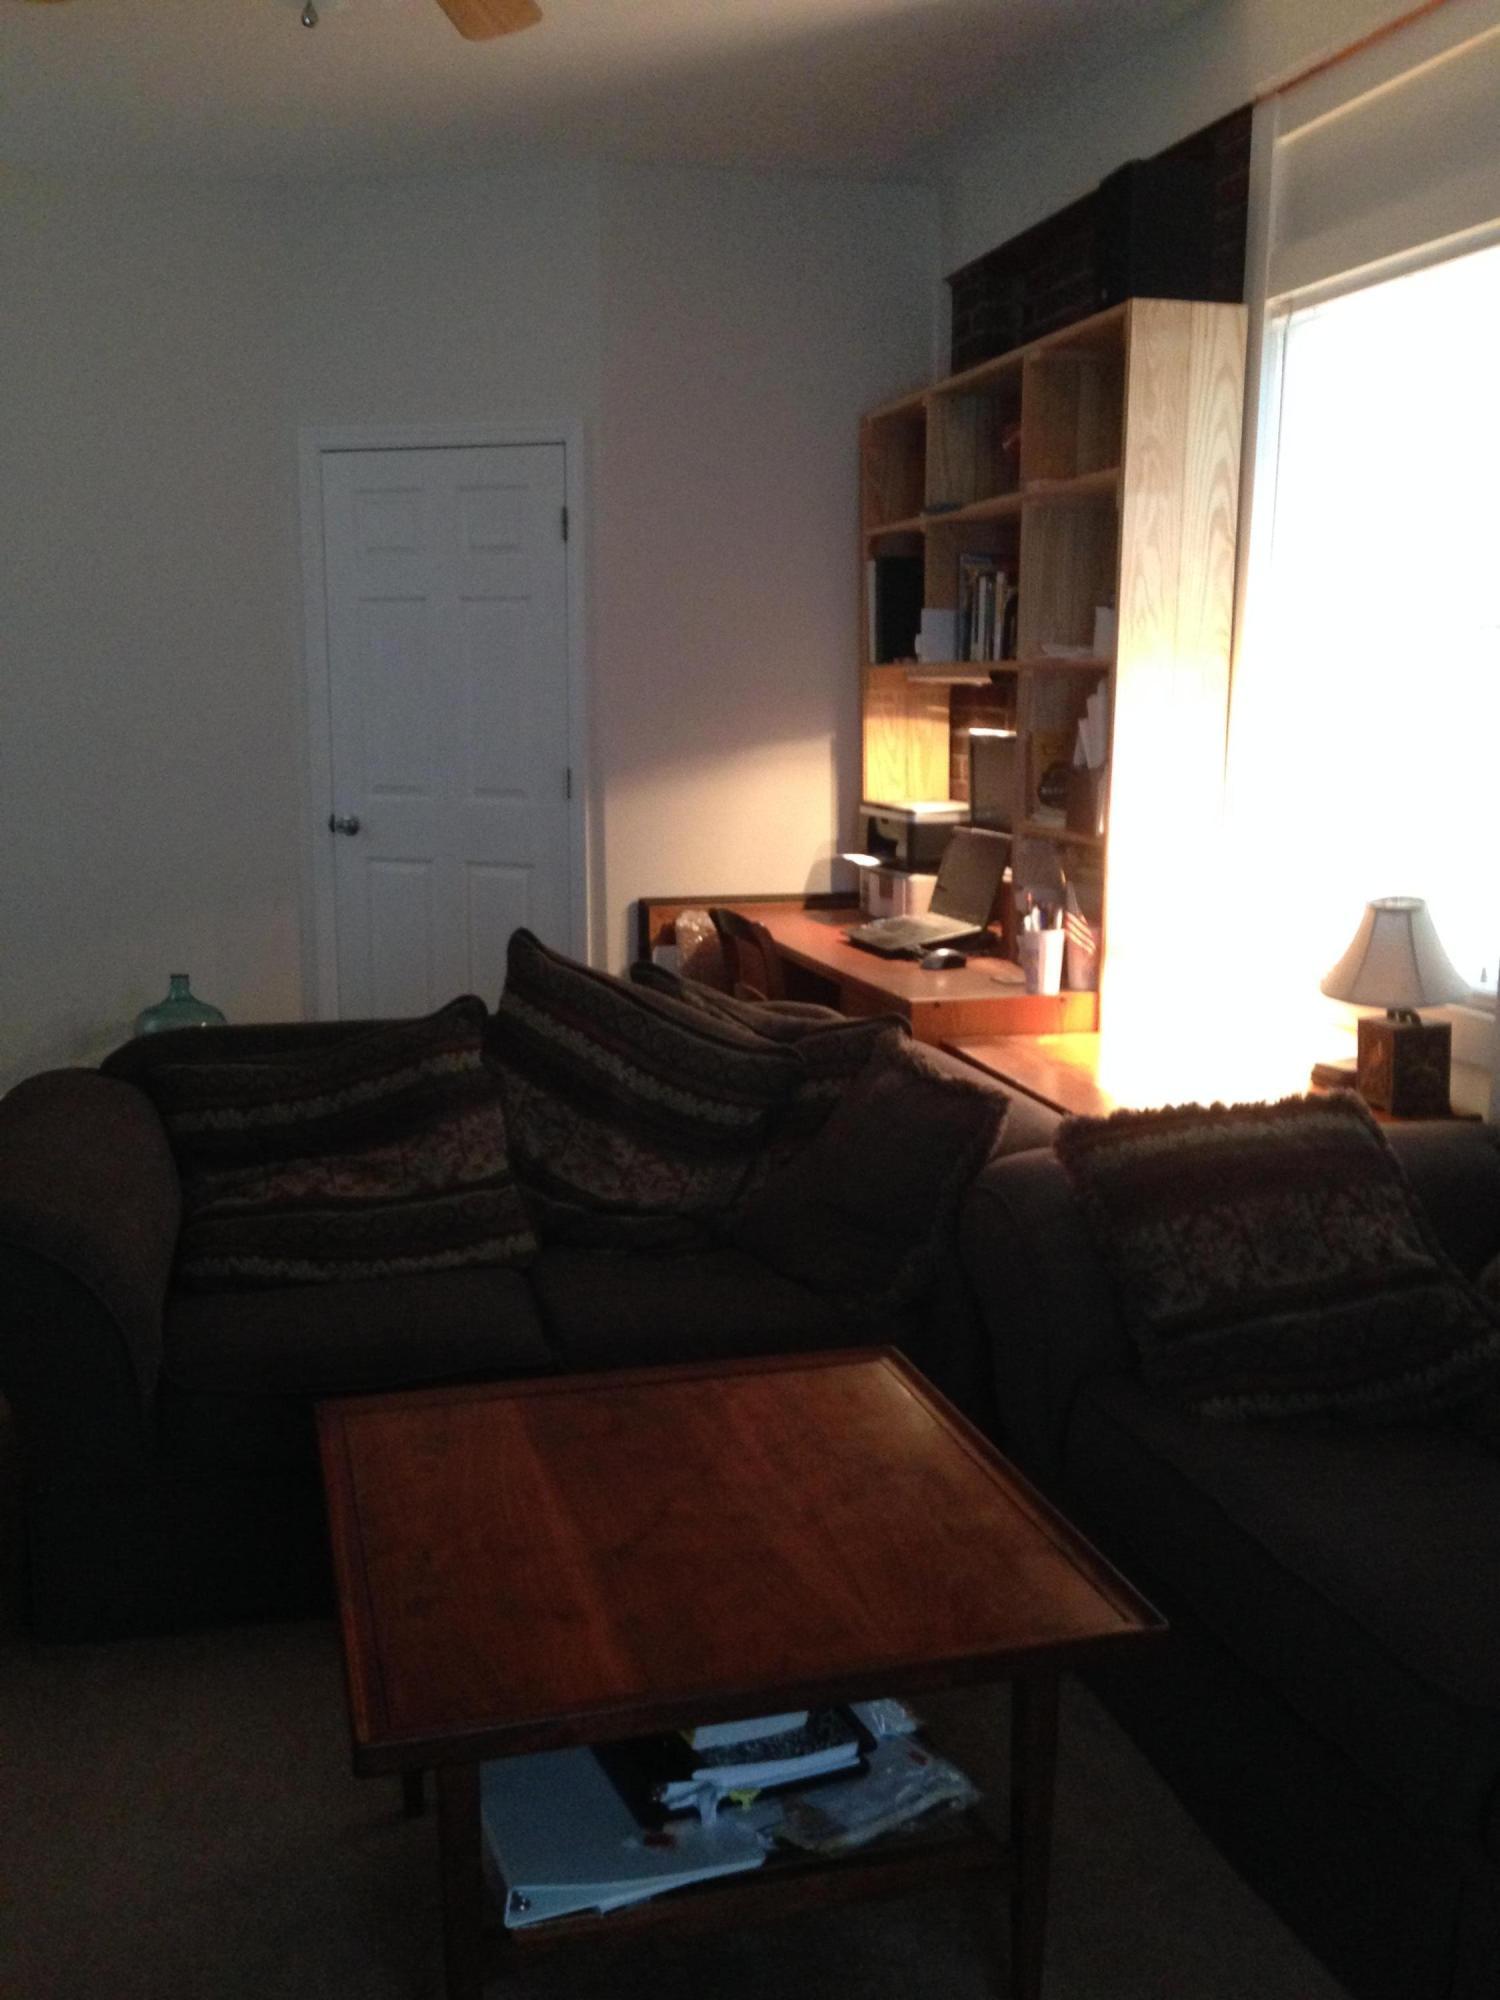 Whitehall Terrace Homes For Sale - 3643 Marginal, Mount Pleasant, SC - 0